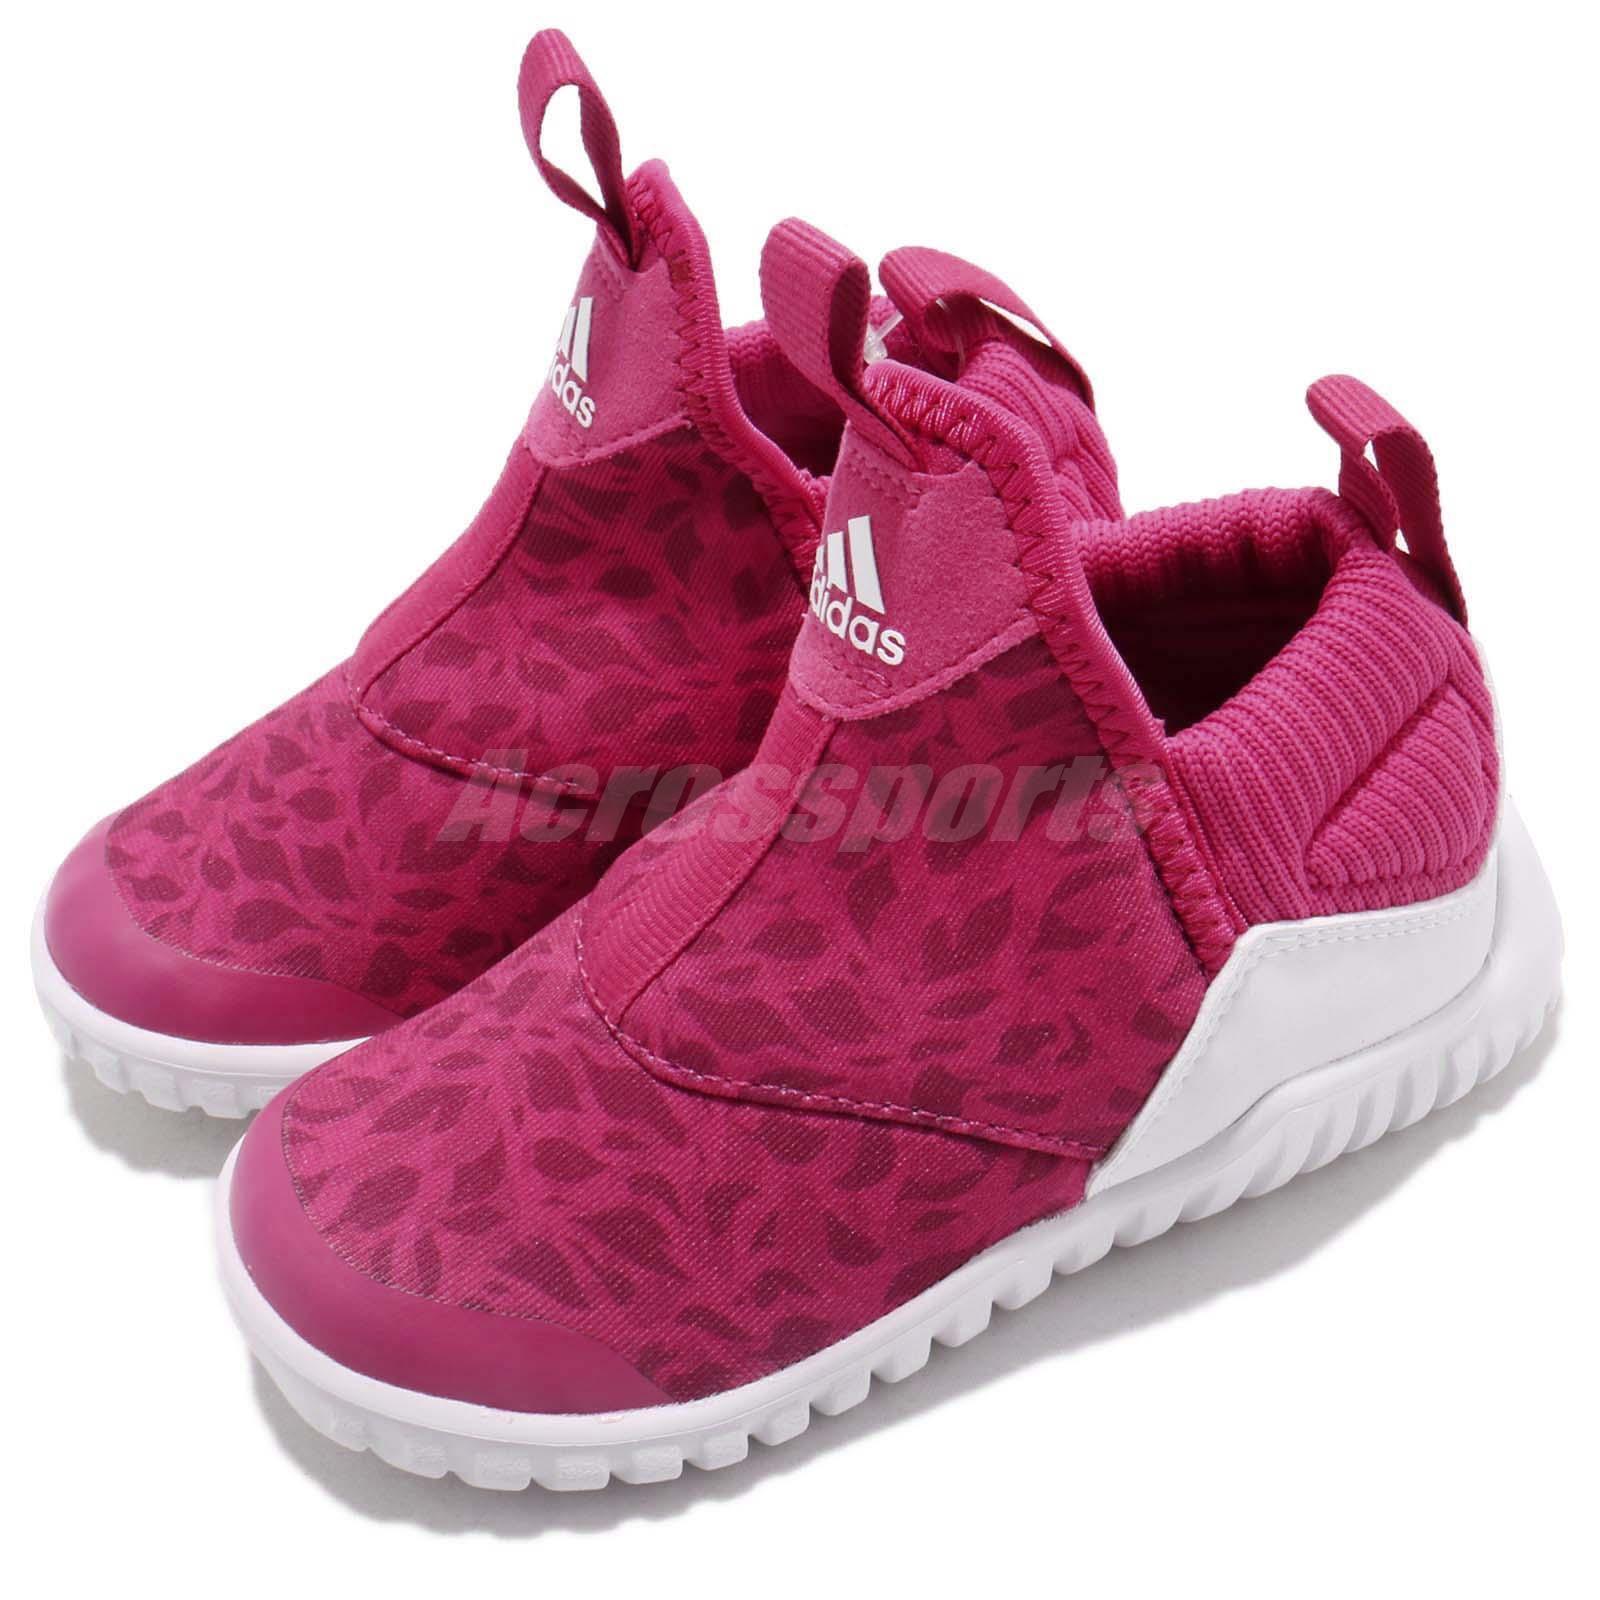 Adidas RapidaZen I Pink White TD Toddler Infant Baby Slip On shoes Sneaker B96350